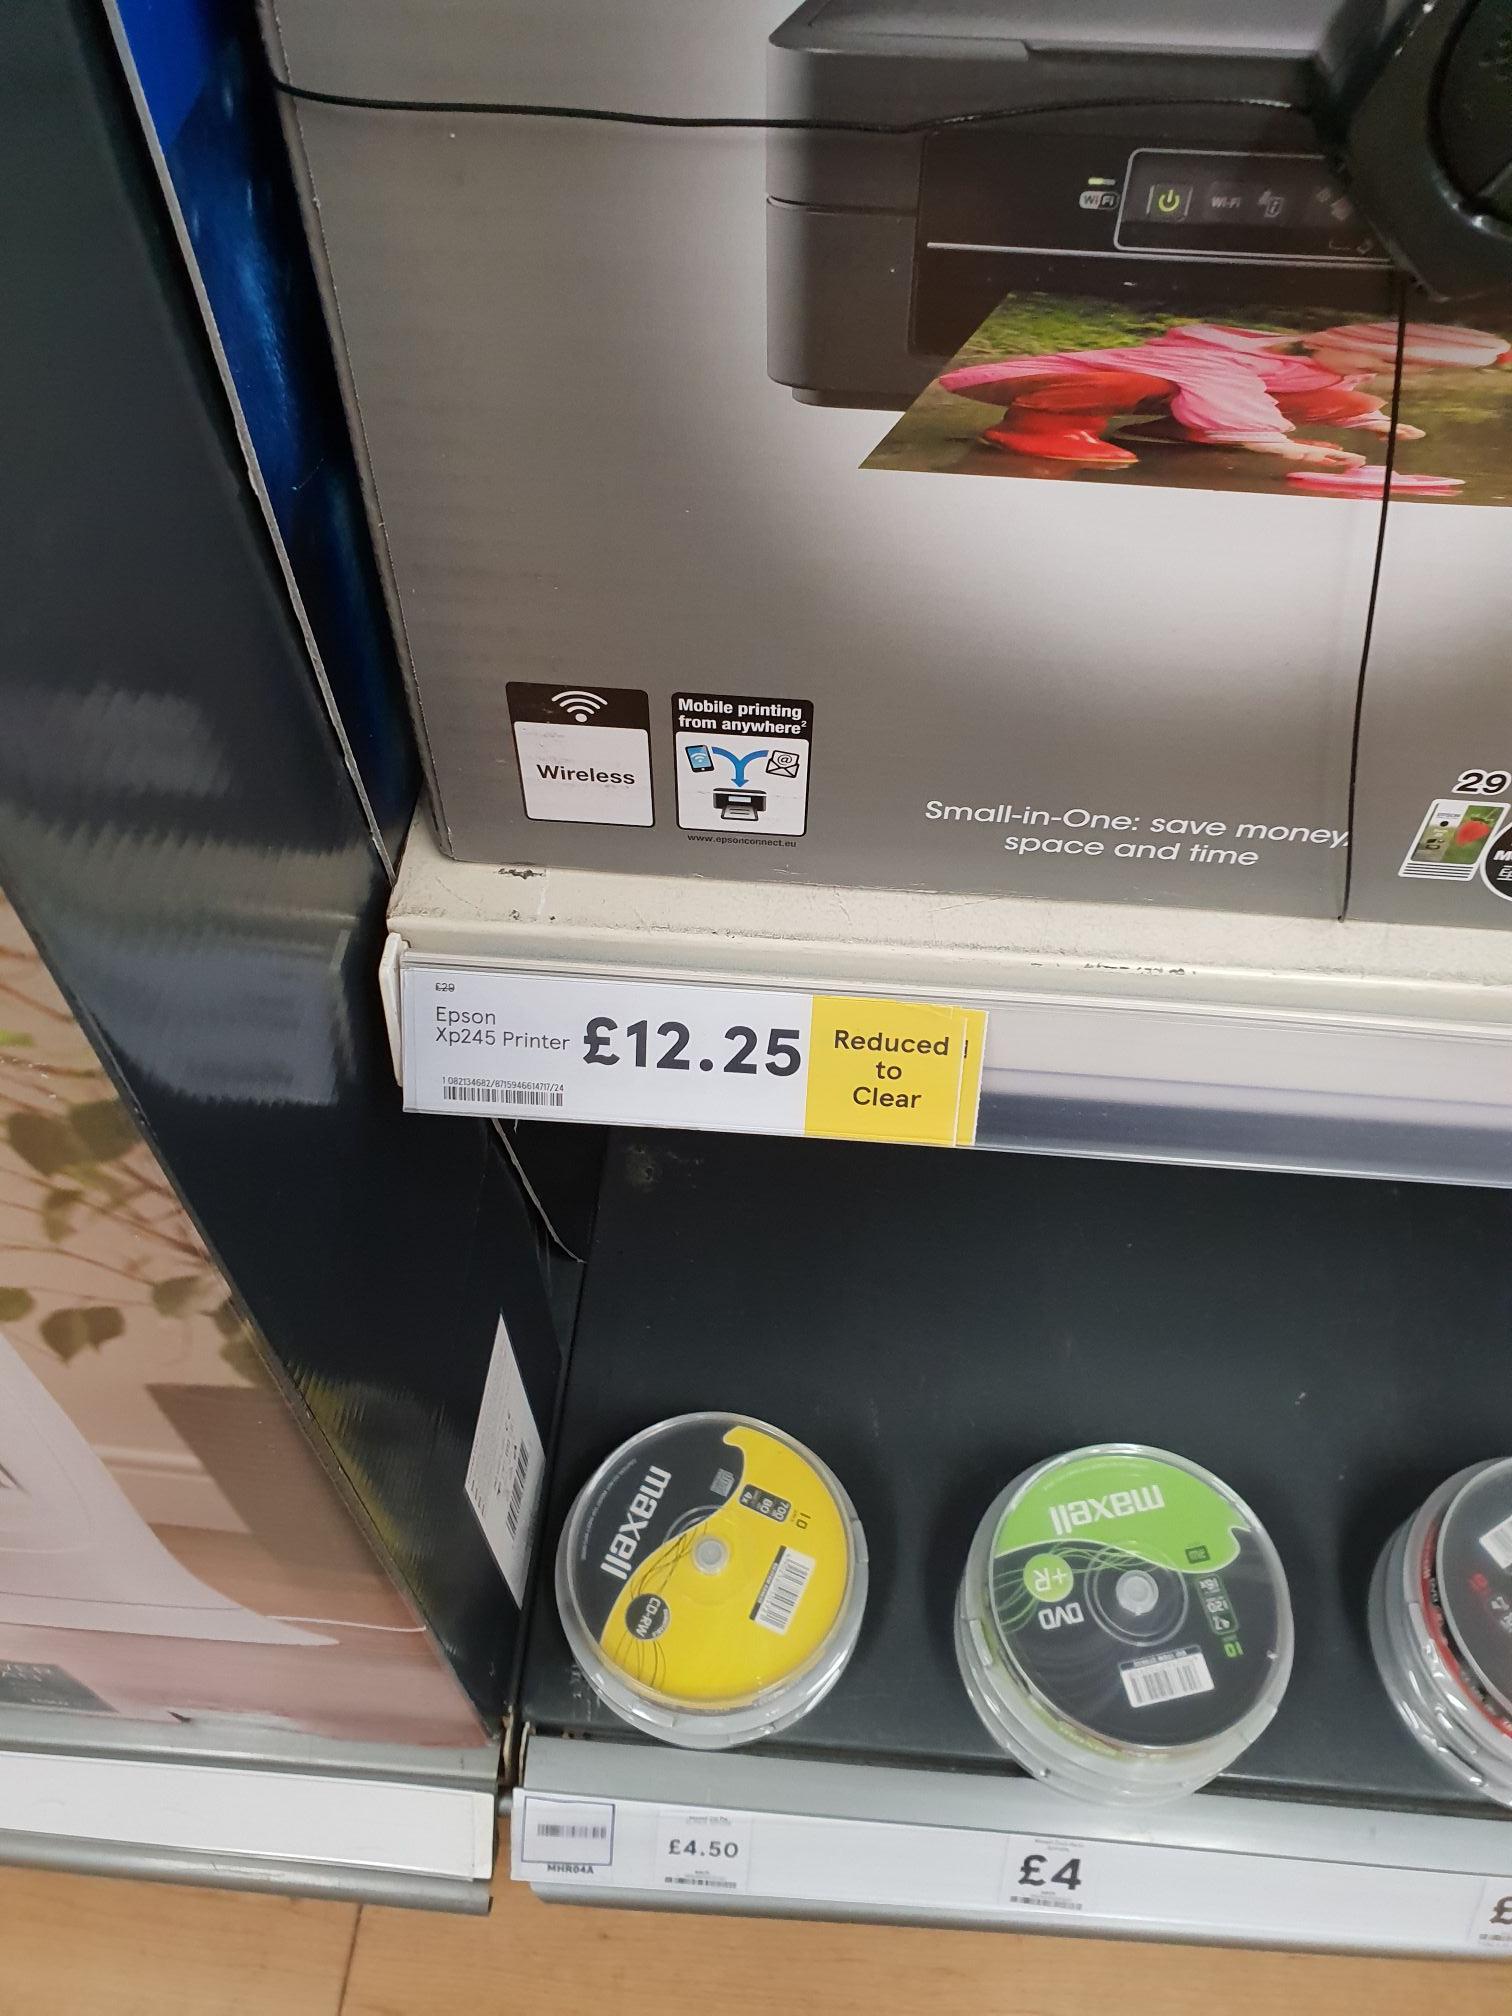 Epson Printer Xp245 £12.25 Tesco national